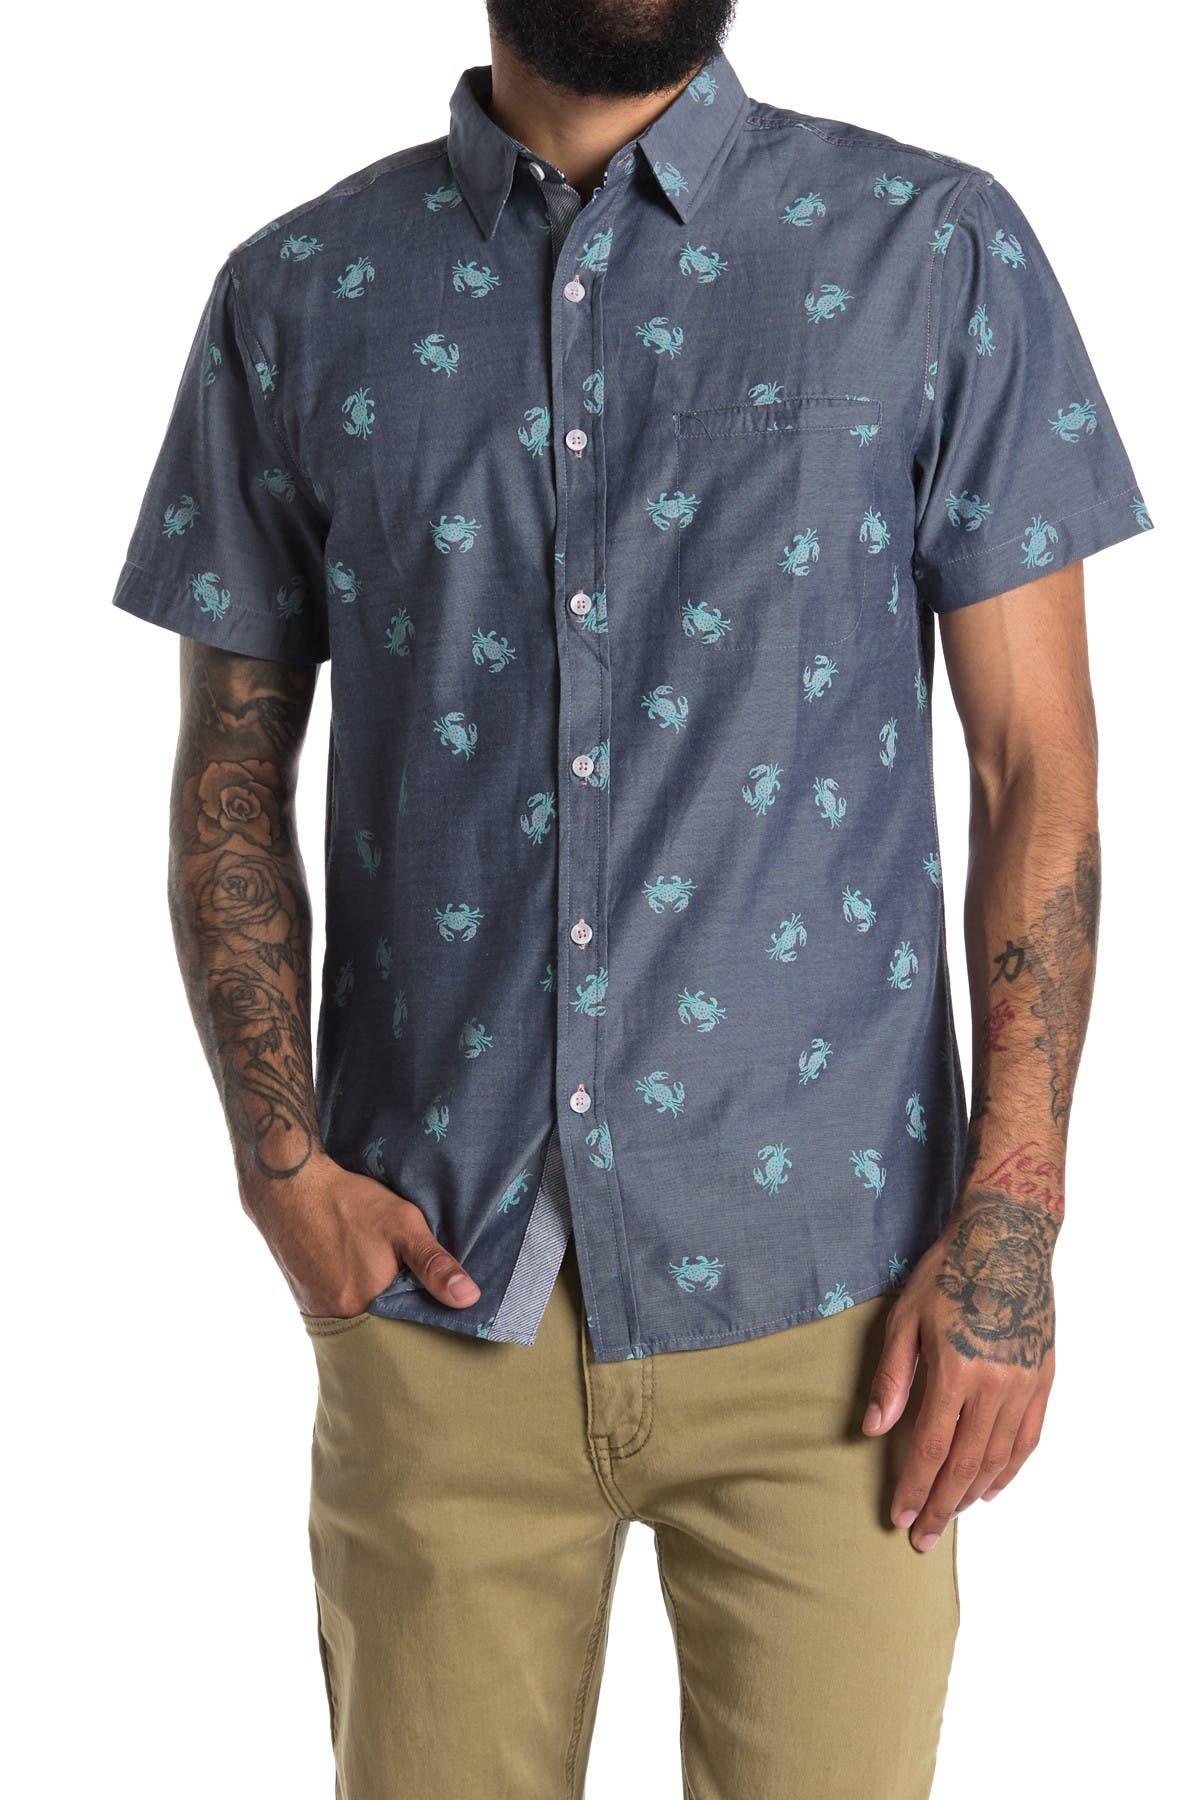 Image of Sovereign Code Atlantic Kiwi Print Regular Fit Shirt